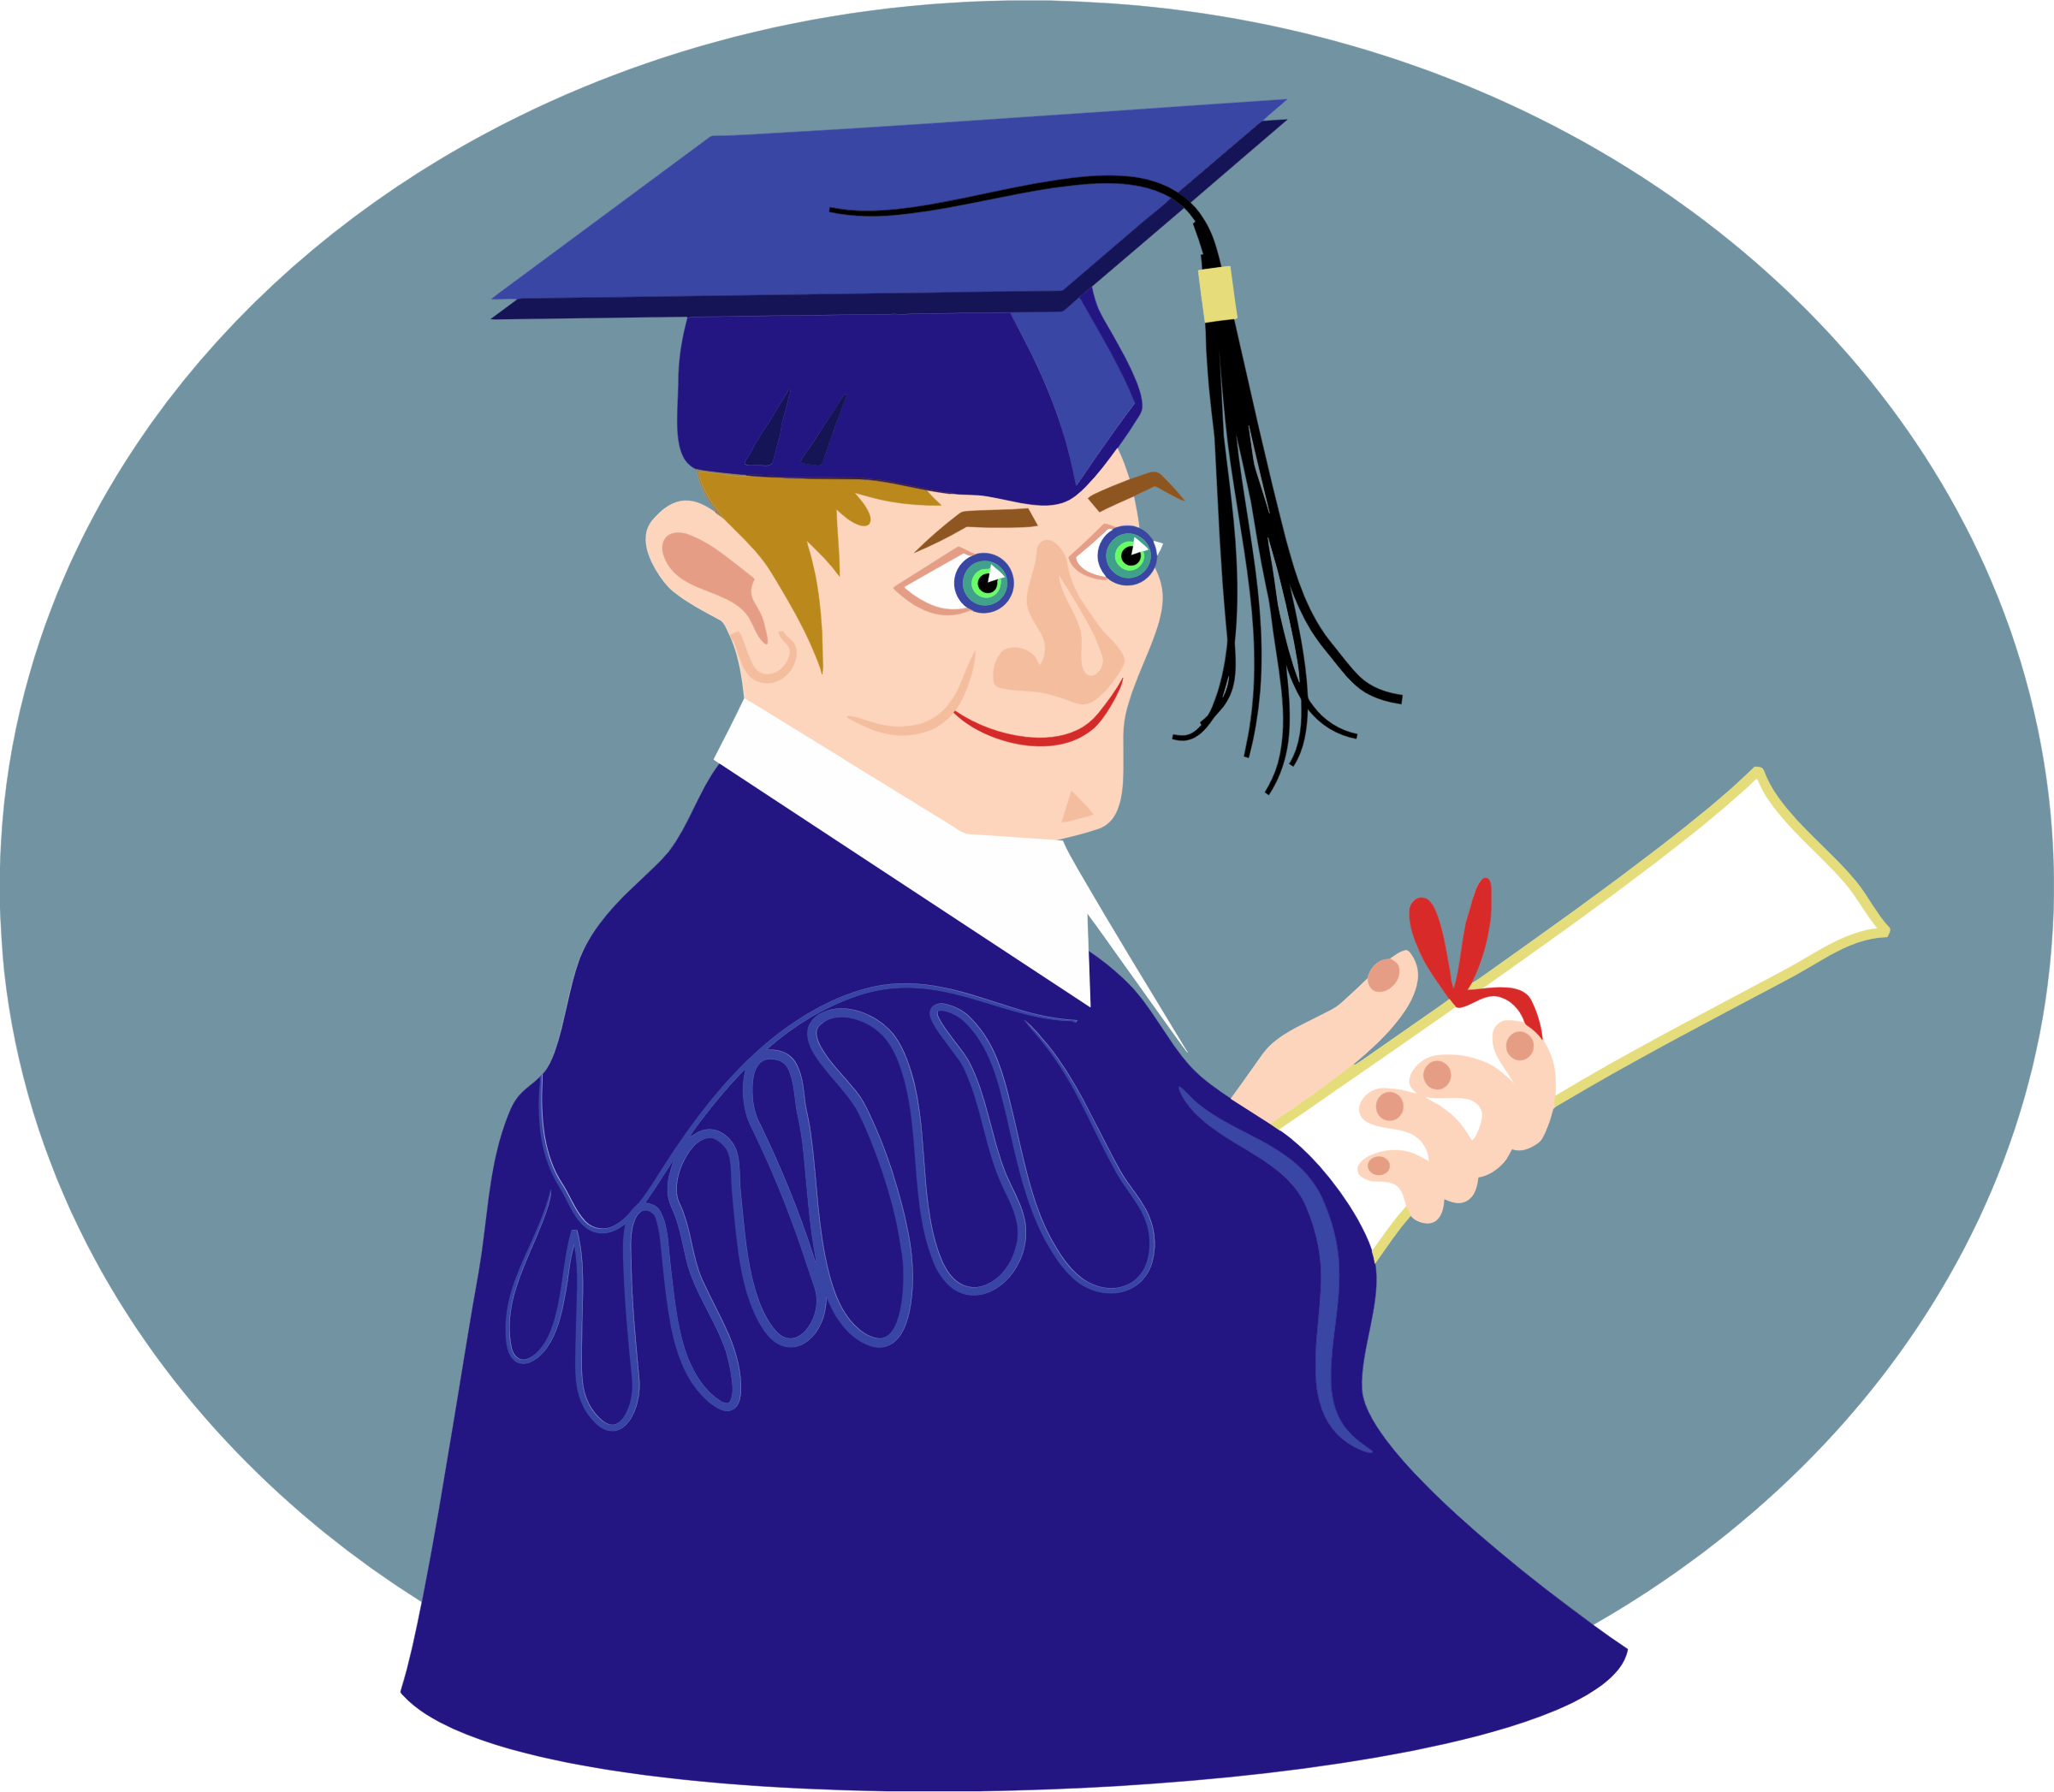 Boy big image png. People clipart graduation